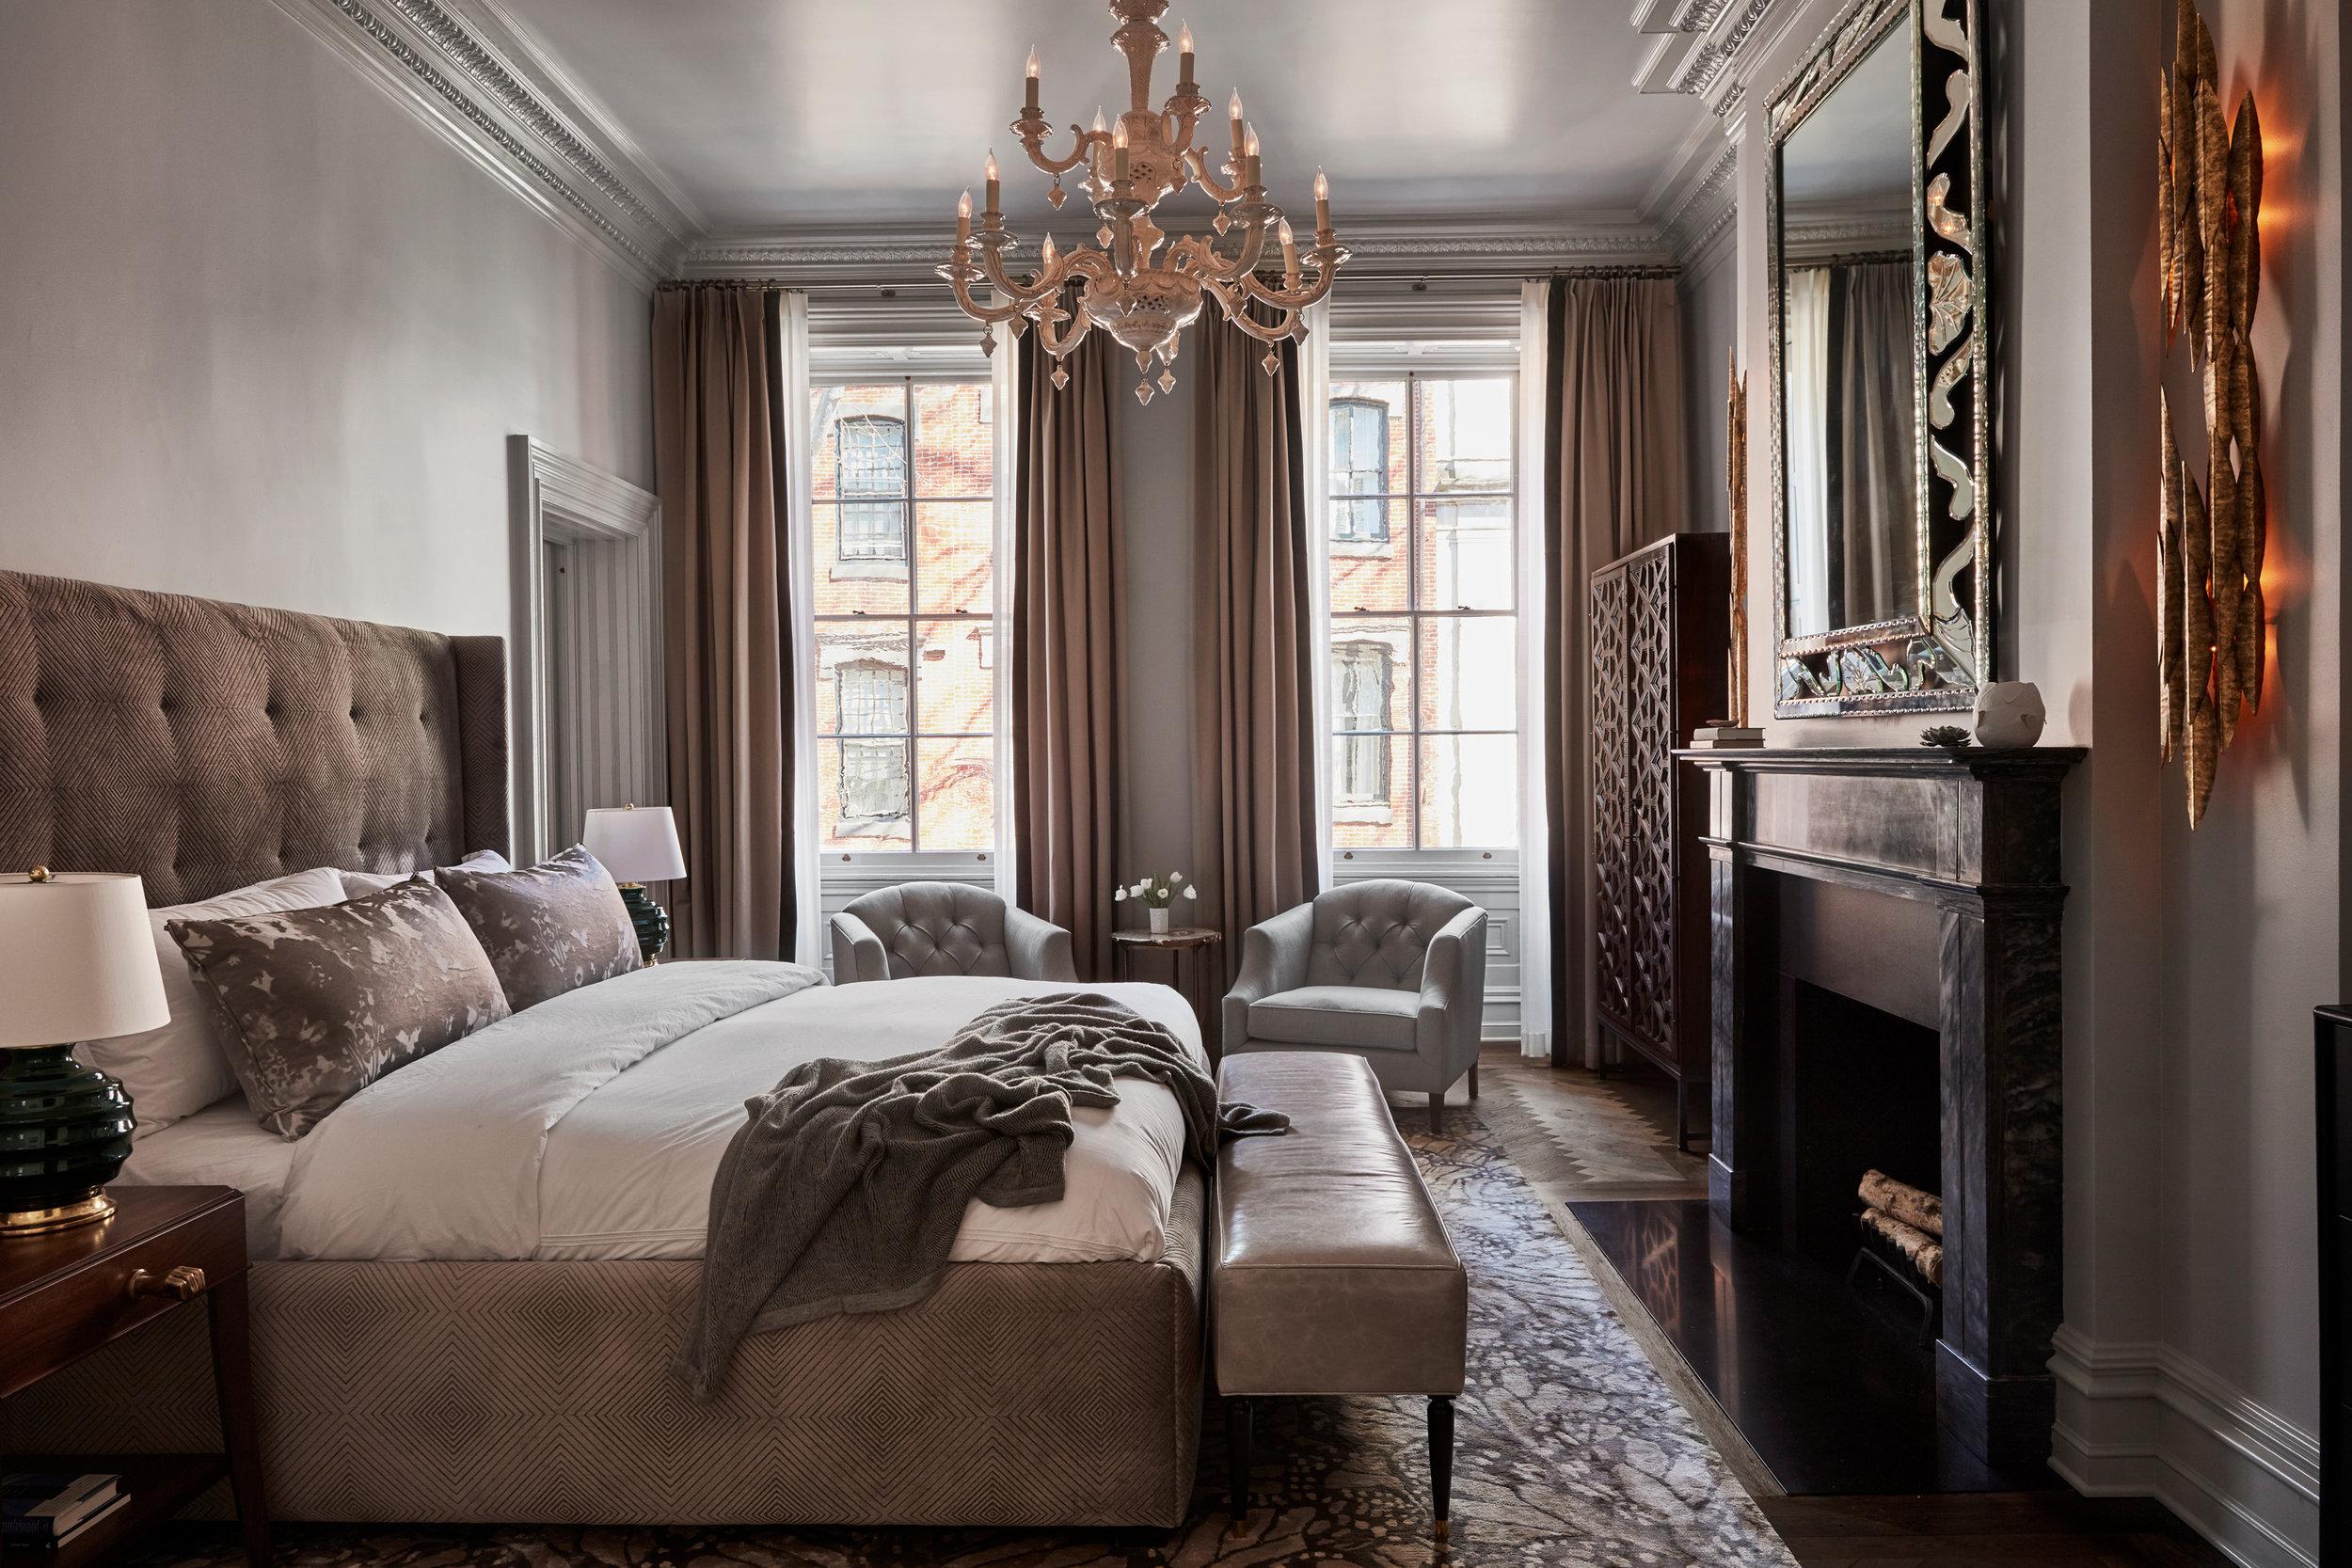 KK DELANCEY_Master Bedroom_029 FINAL Credit Jason Varney.jpg